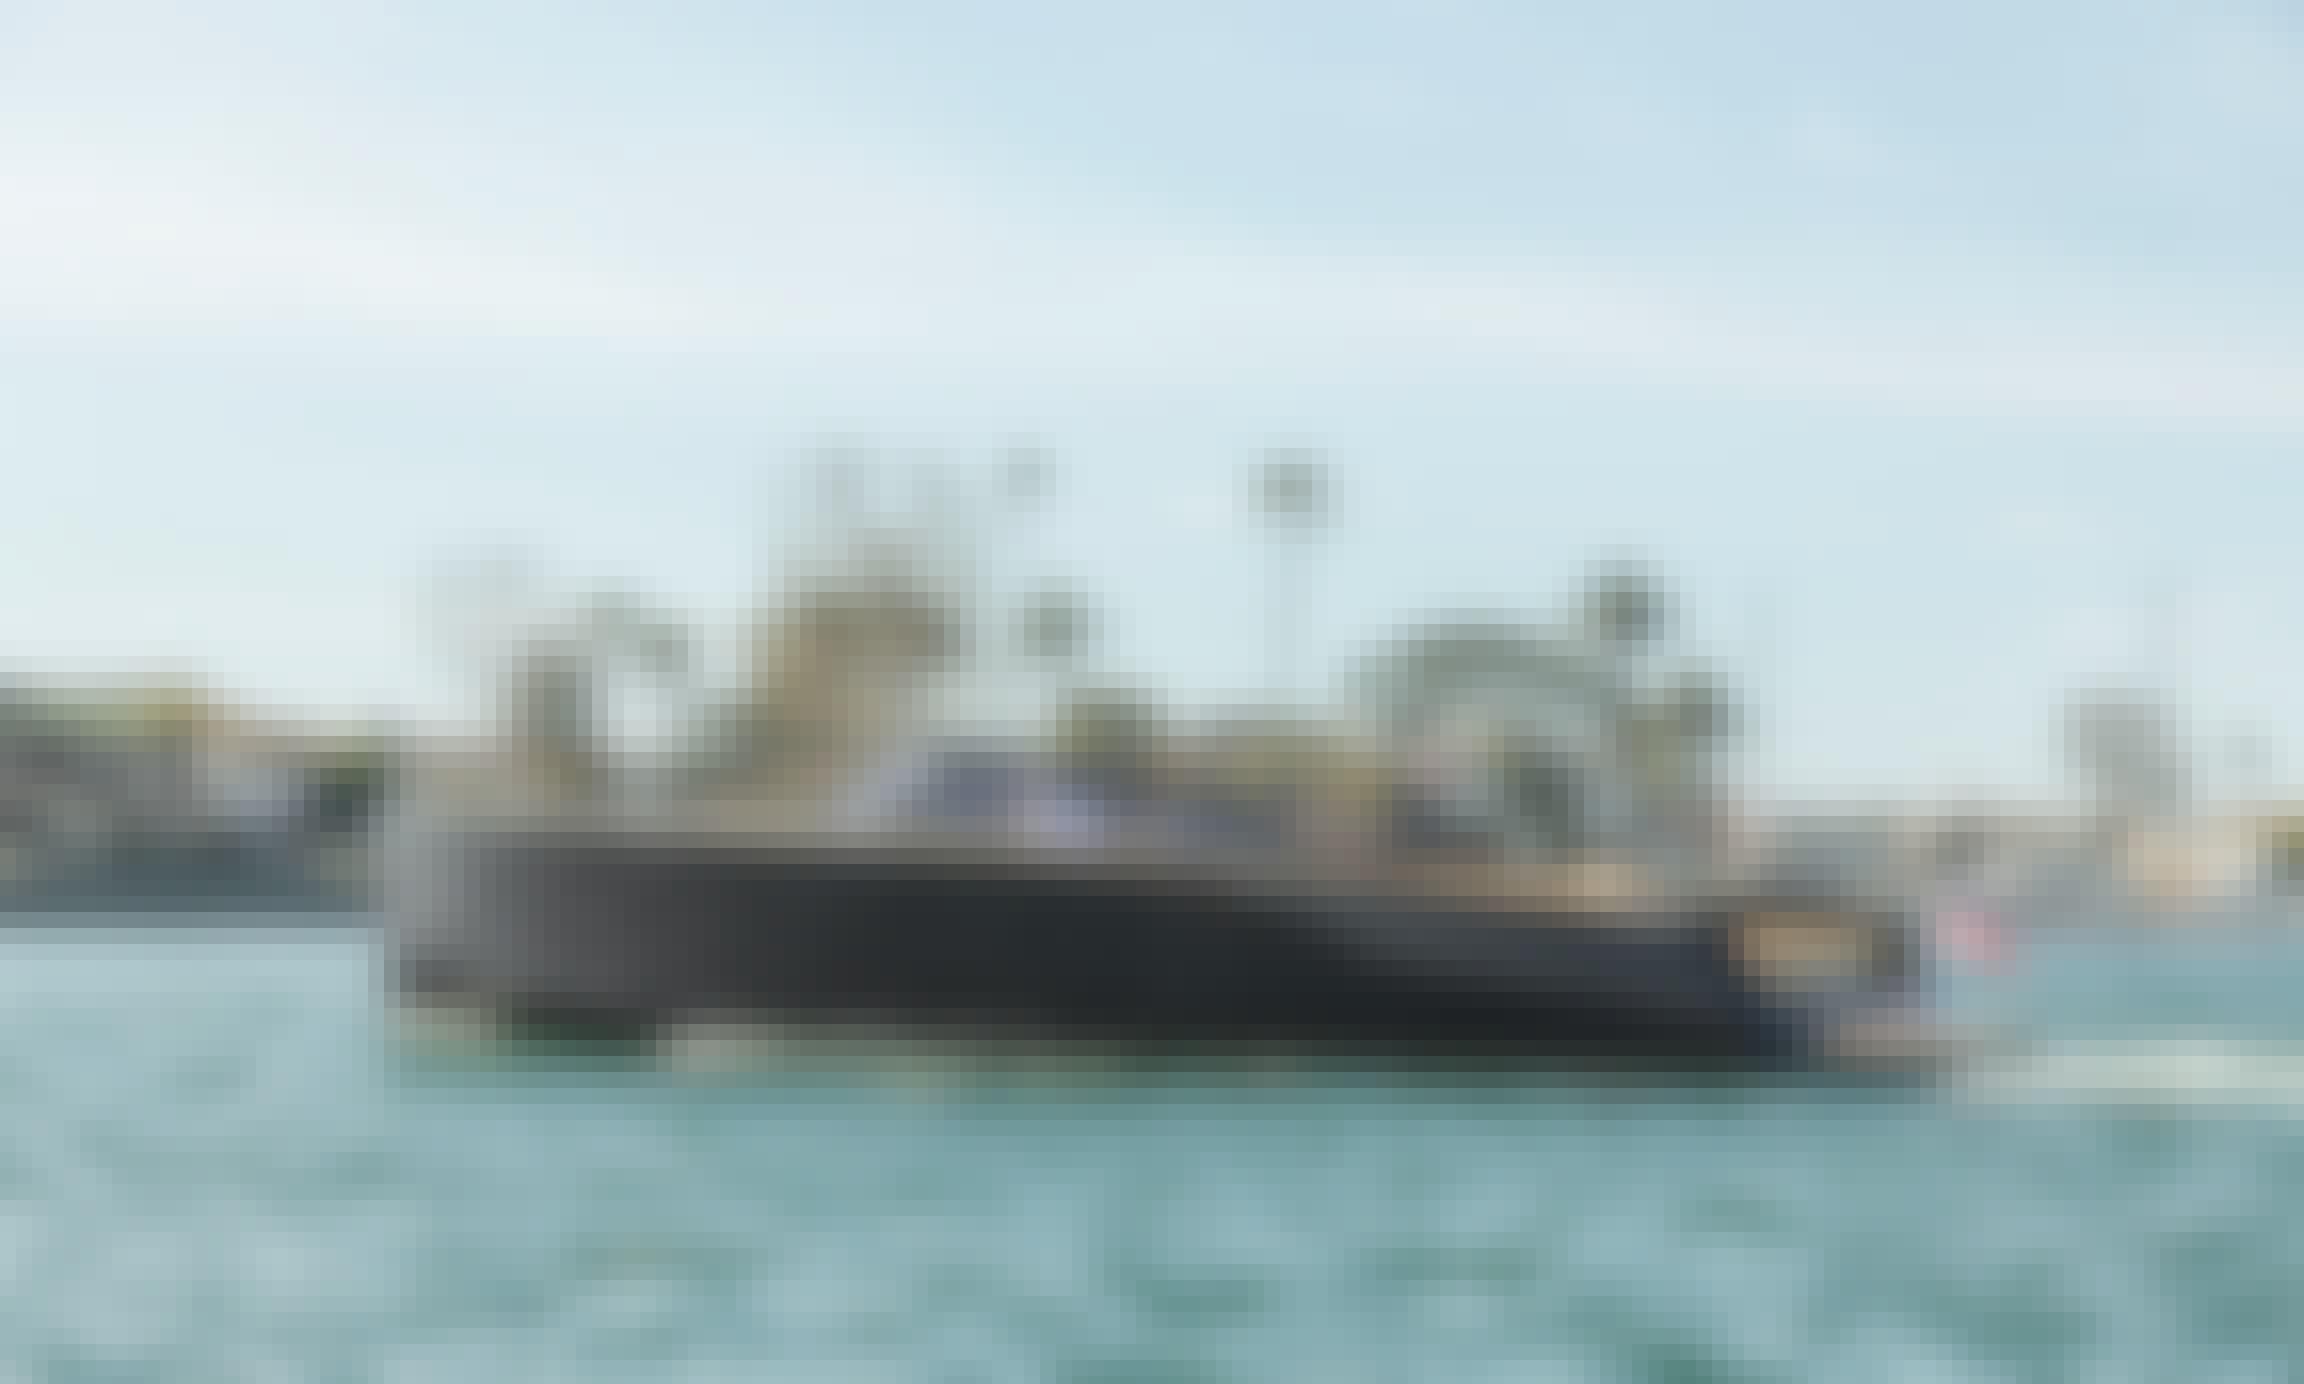 40' VanDutch Luxury Yacht. Featured in HBOs Ballers